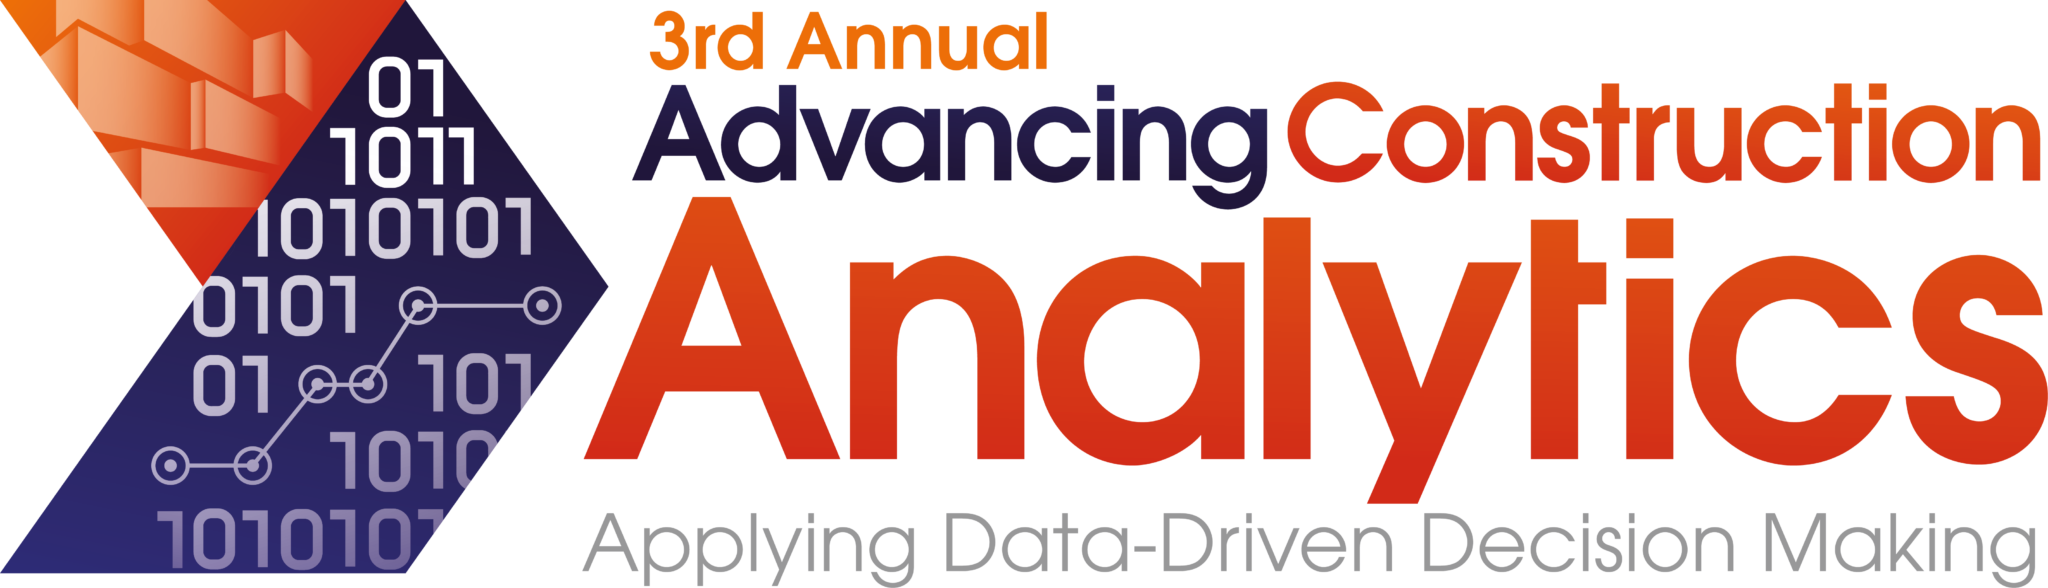 HW210222-Advancing-Construction-Analytics-2021-logo-2048x588